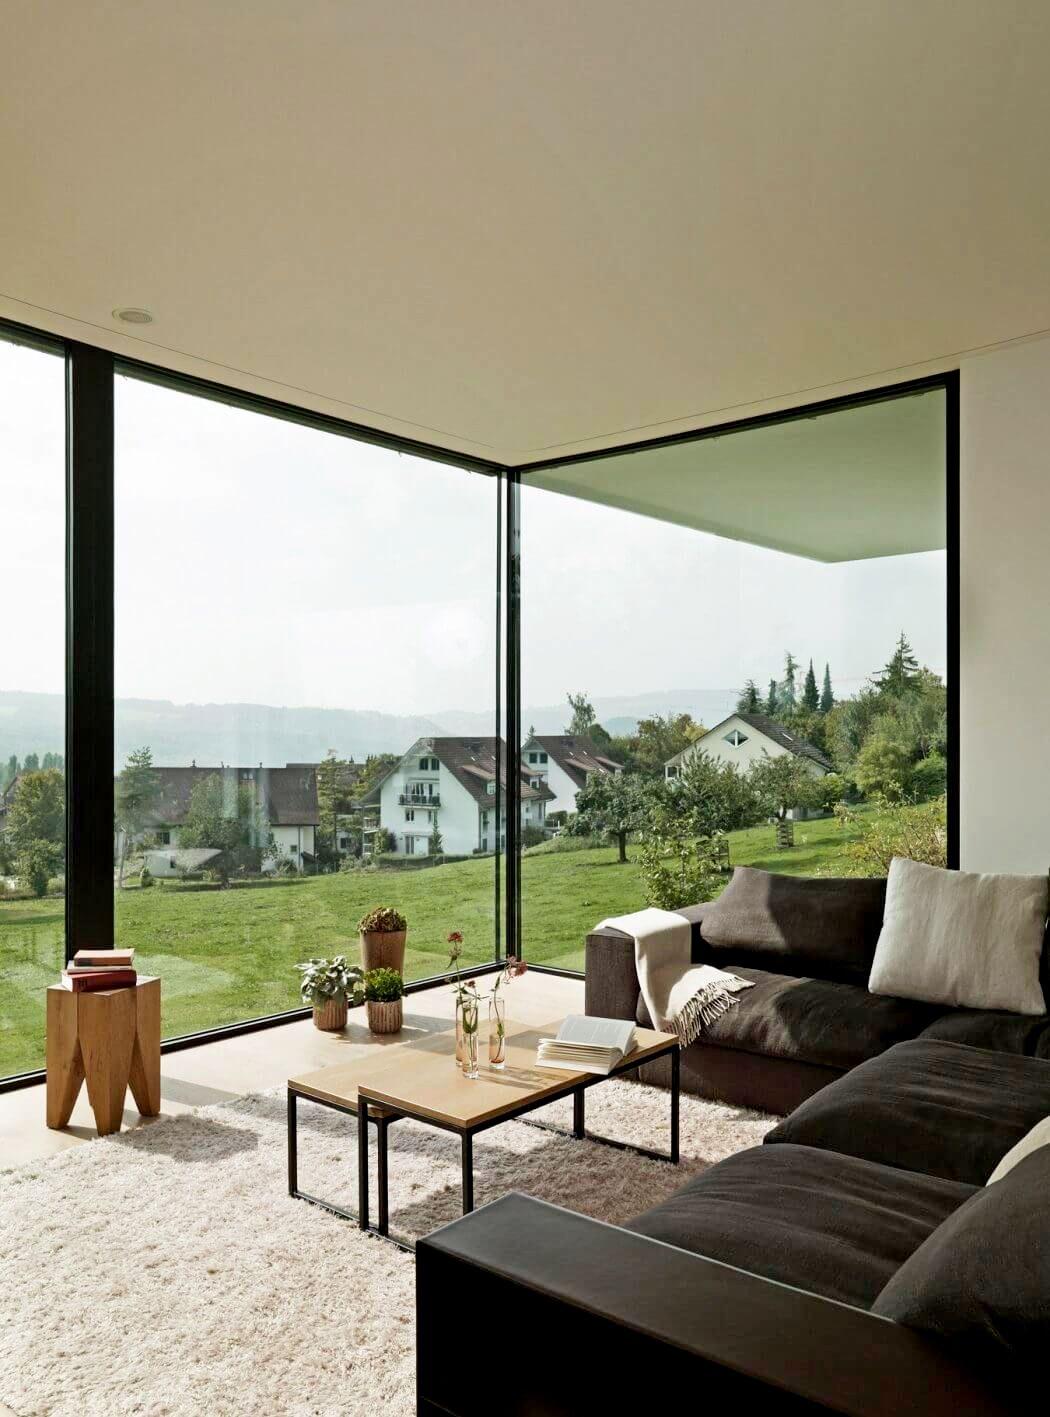 kottedzh-s-panoramnymi-oknami